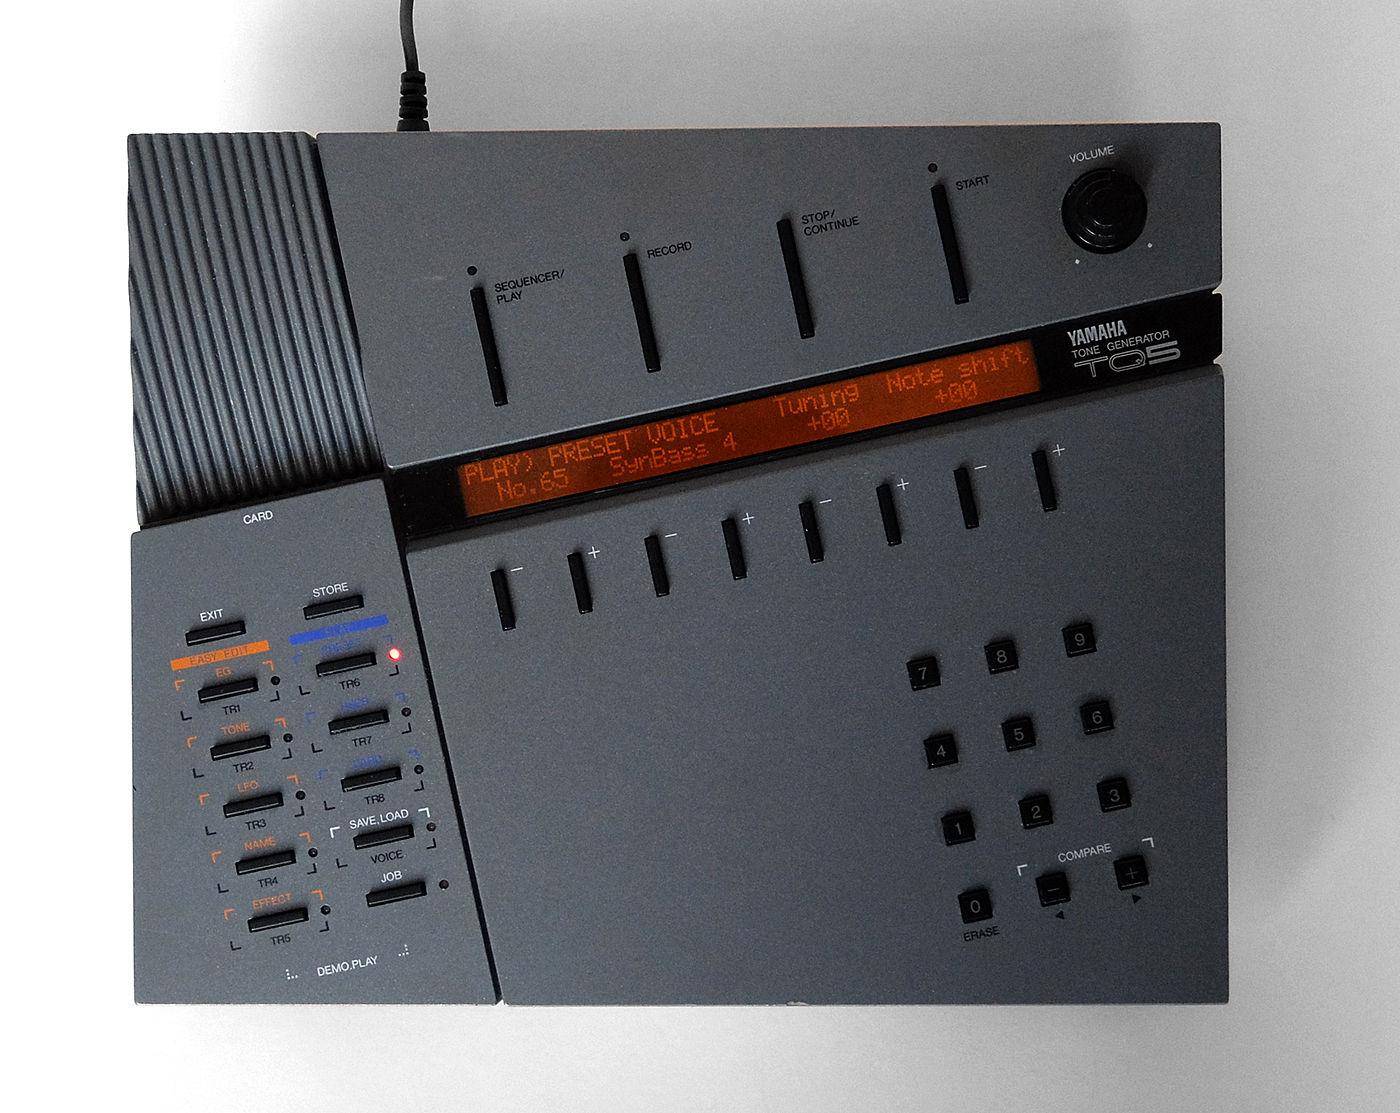 MATRIXSYNTH: YAMAHA TQ5 FM Digital Synthesizer - Classic